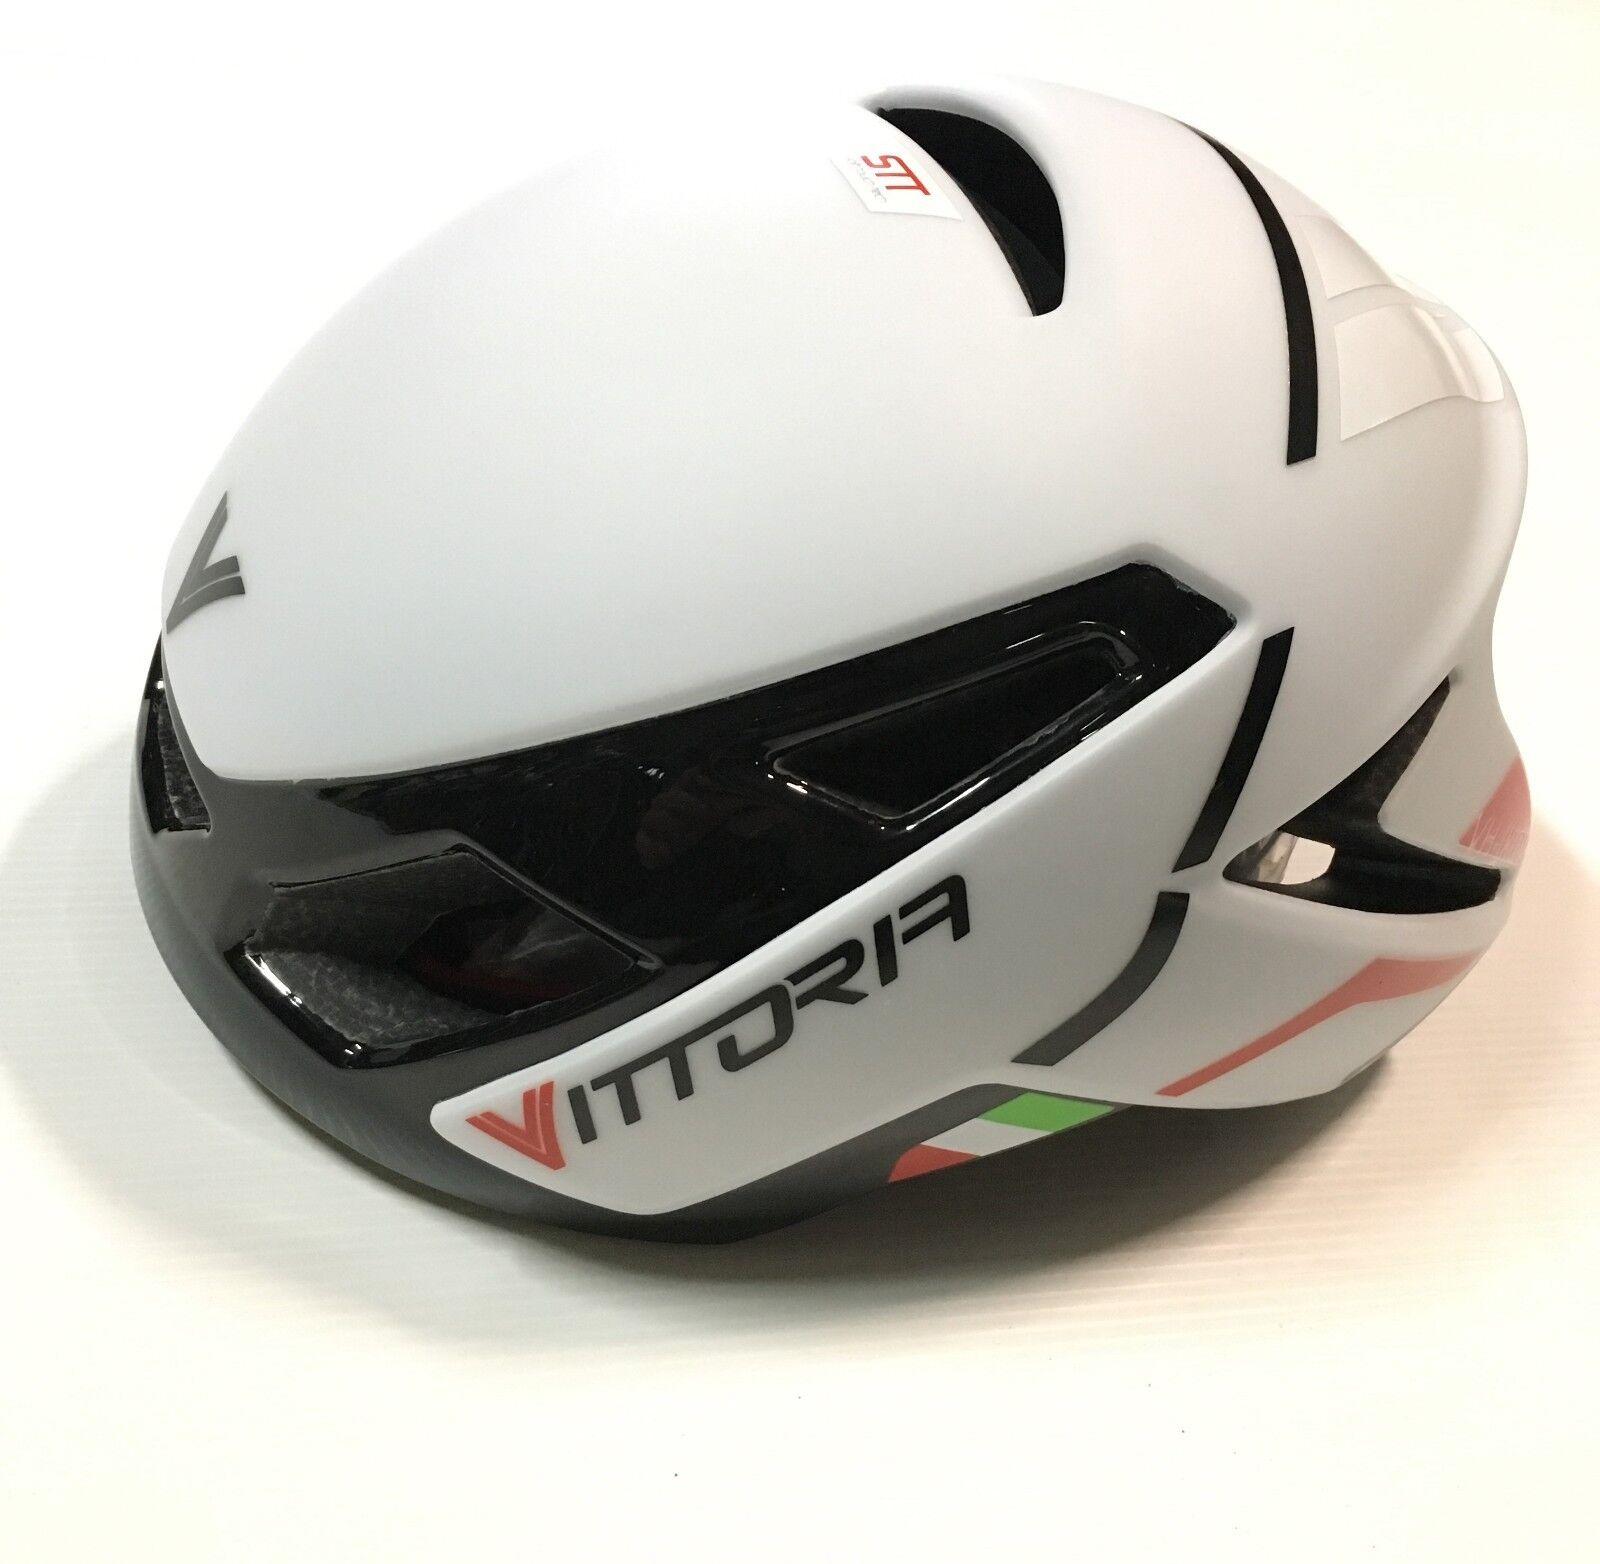 Casco bici corsa Vittoria VH Ikon bianco white road bike  helmet L-XL 58-62 cm  at cheap